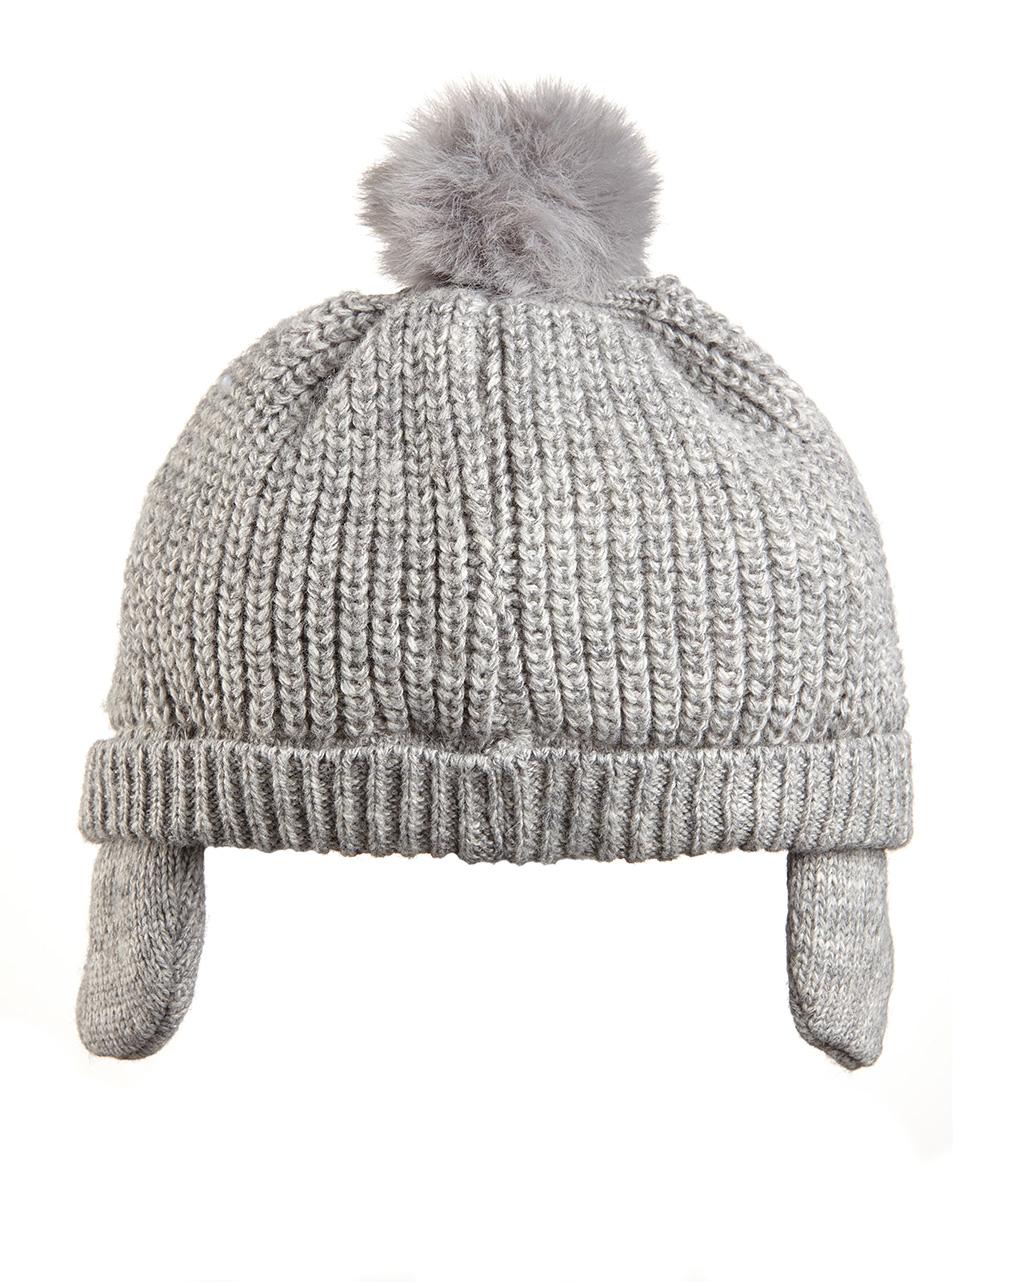 Cappello lana con pon pon - Prénatal